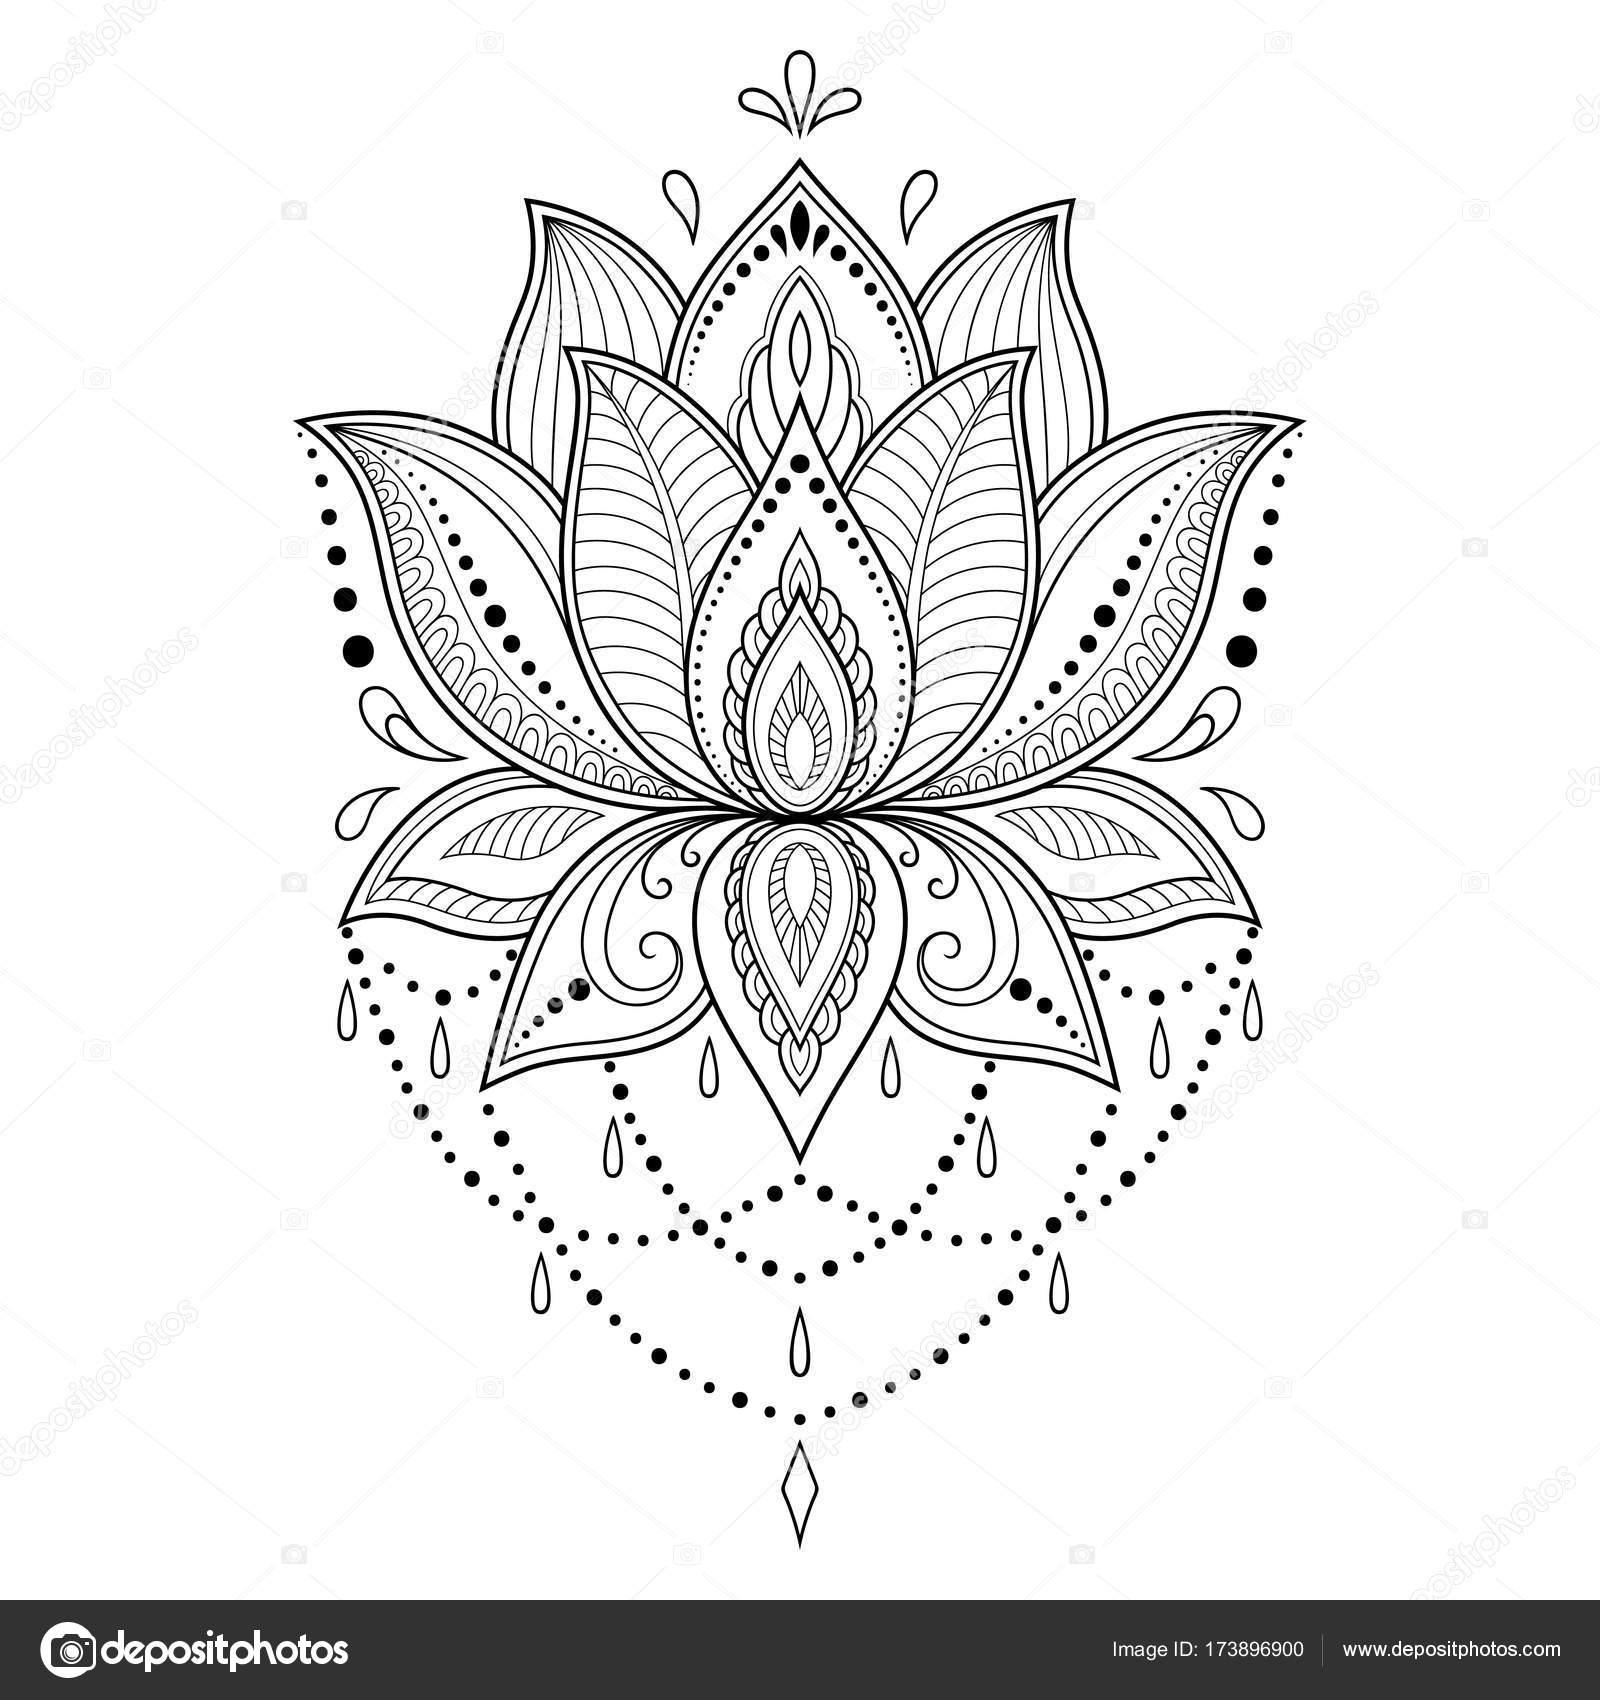 Moldes De Flores Para Tatuajes Plantilla Flor Tatuaje Henna Estilo